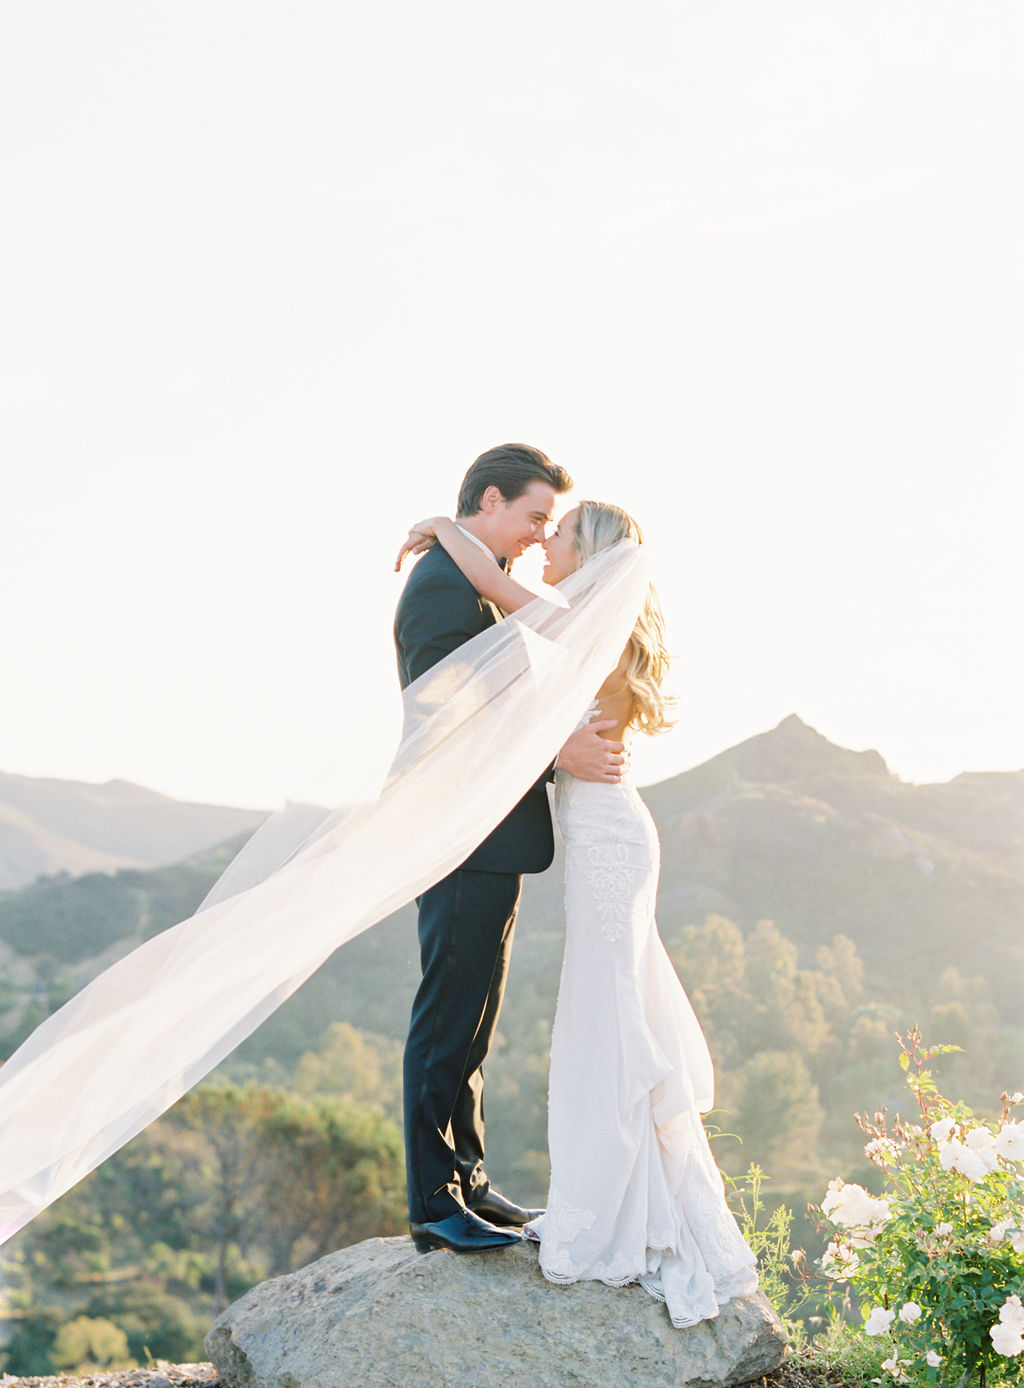 LILY & KEVIN  Malibu, CA, — The Great Romance